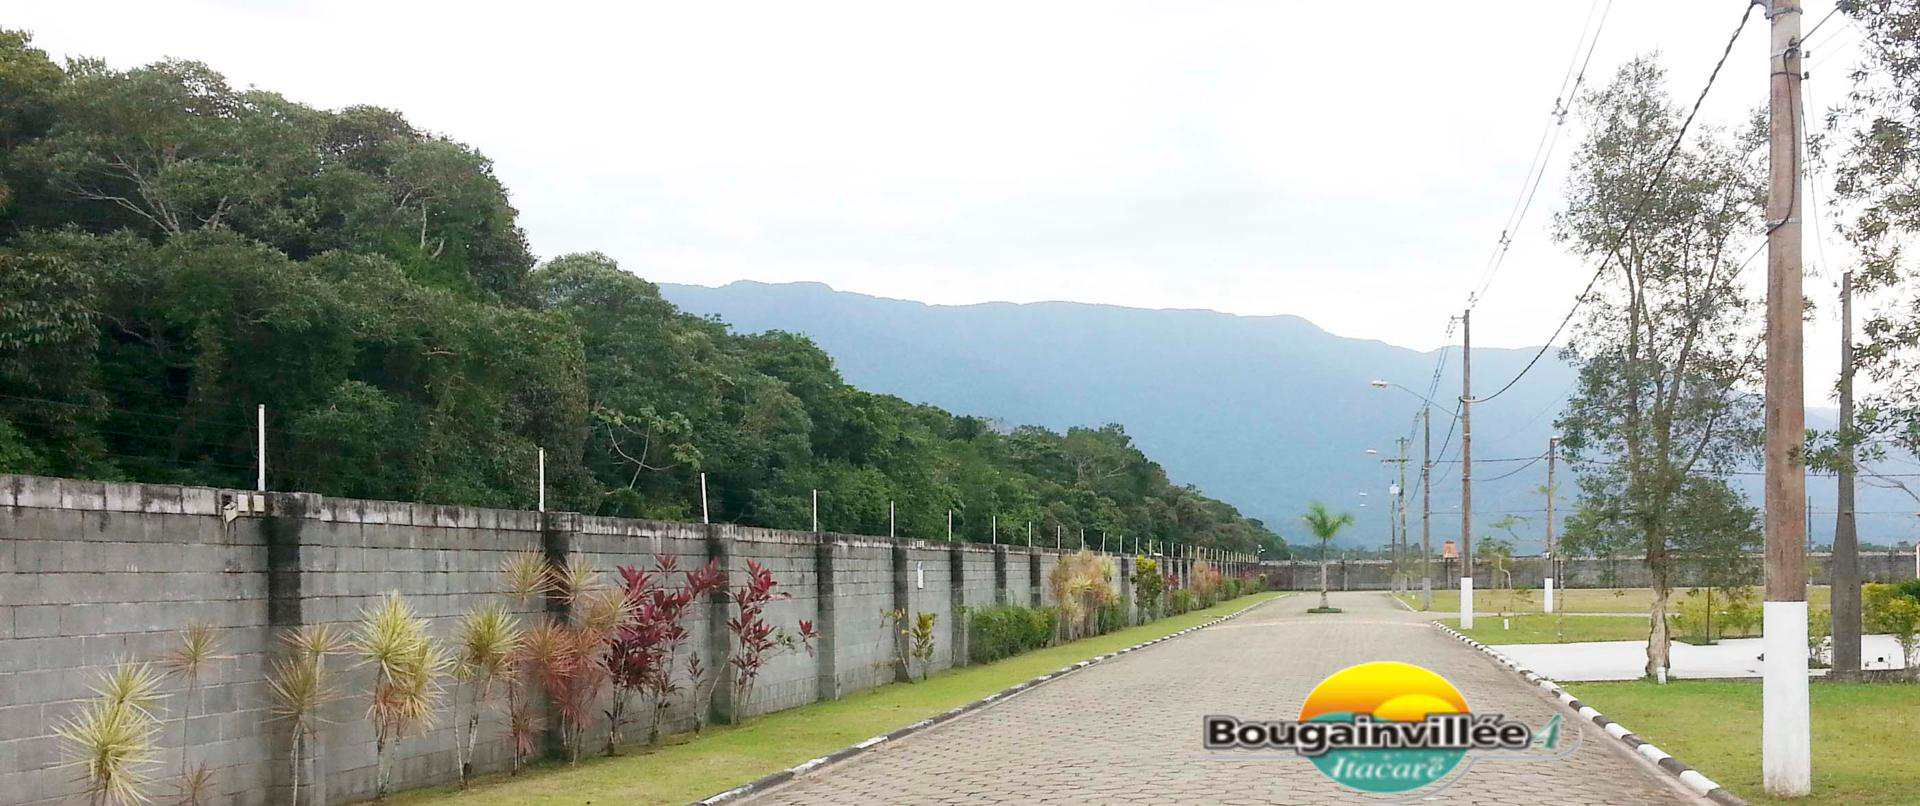 Bougainville 4 lazer 10